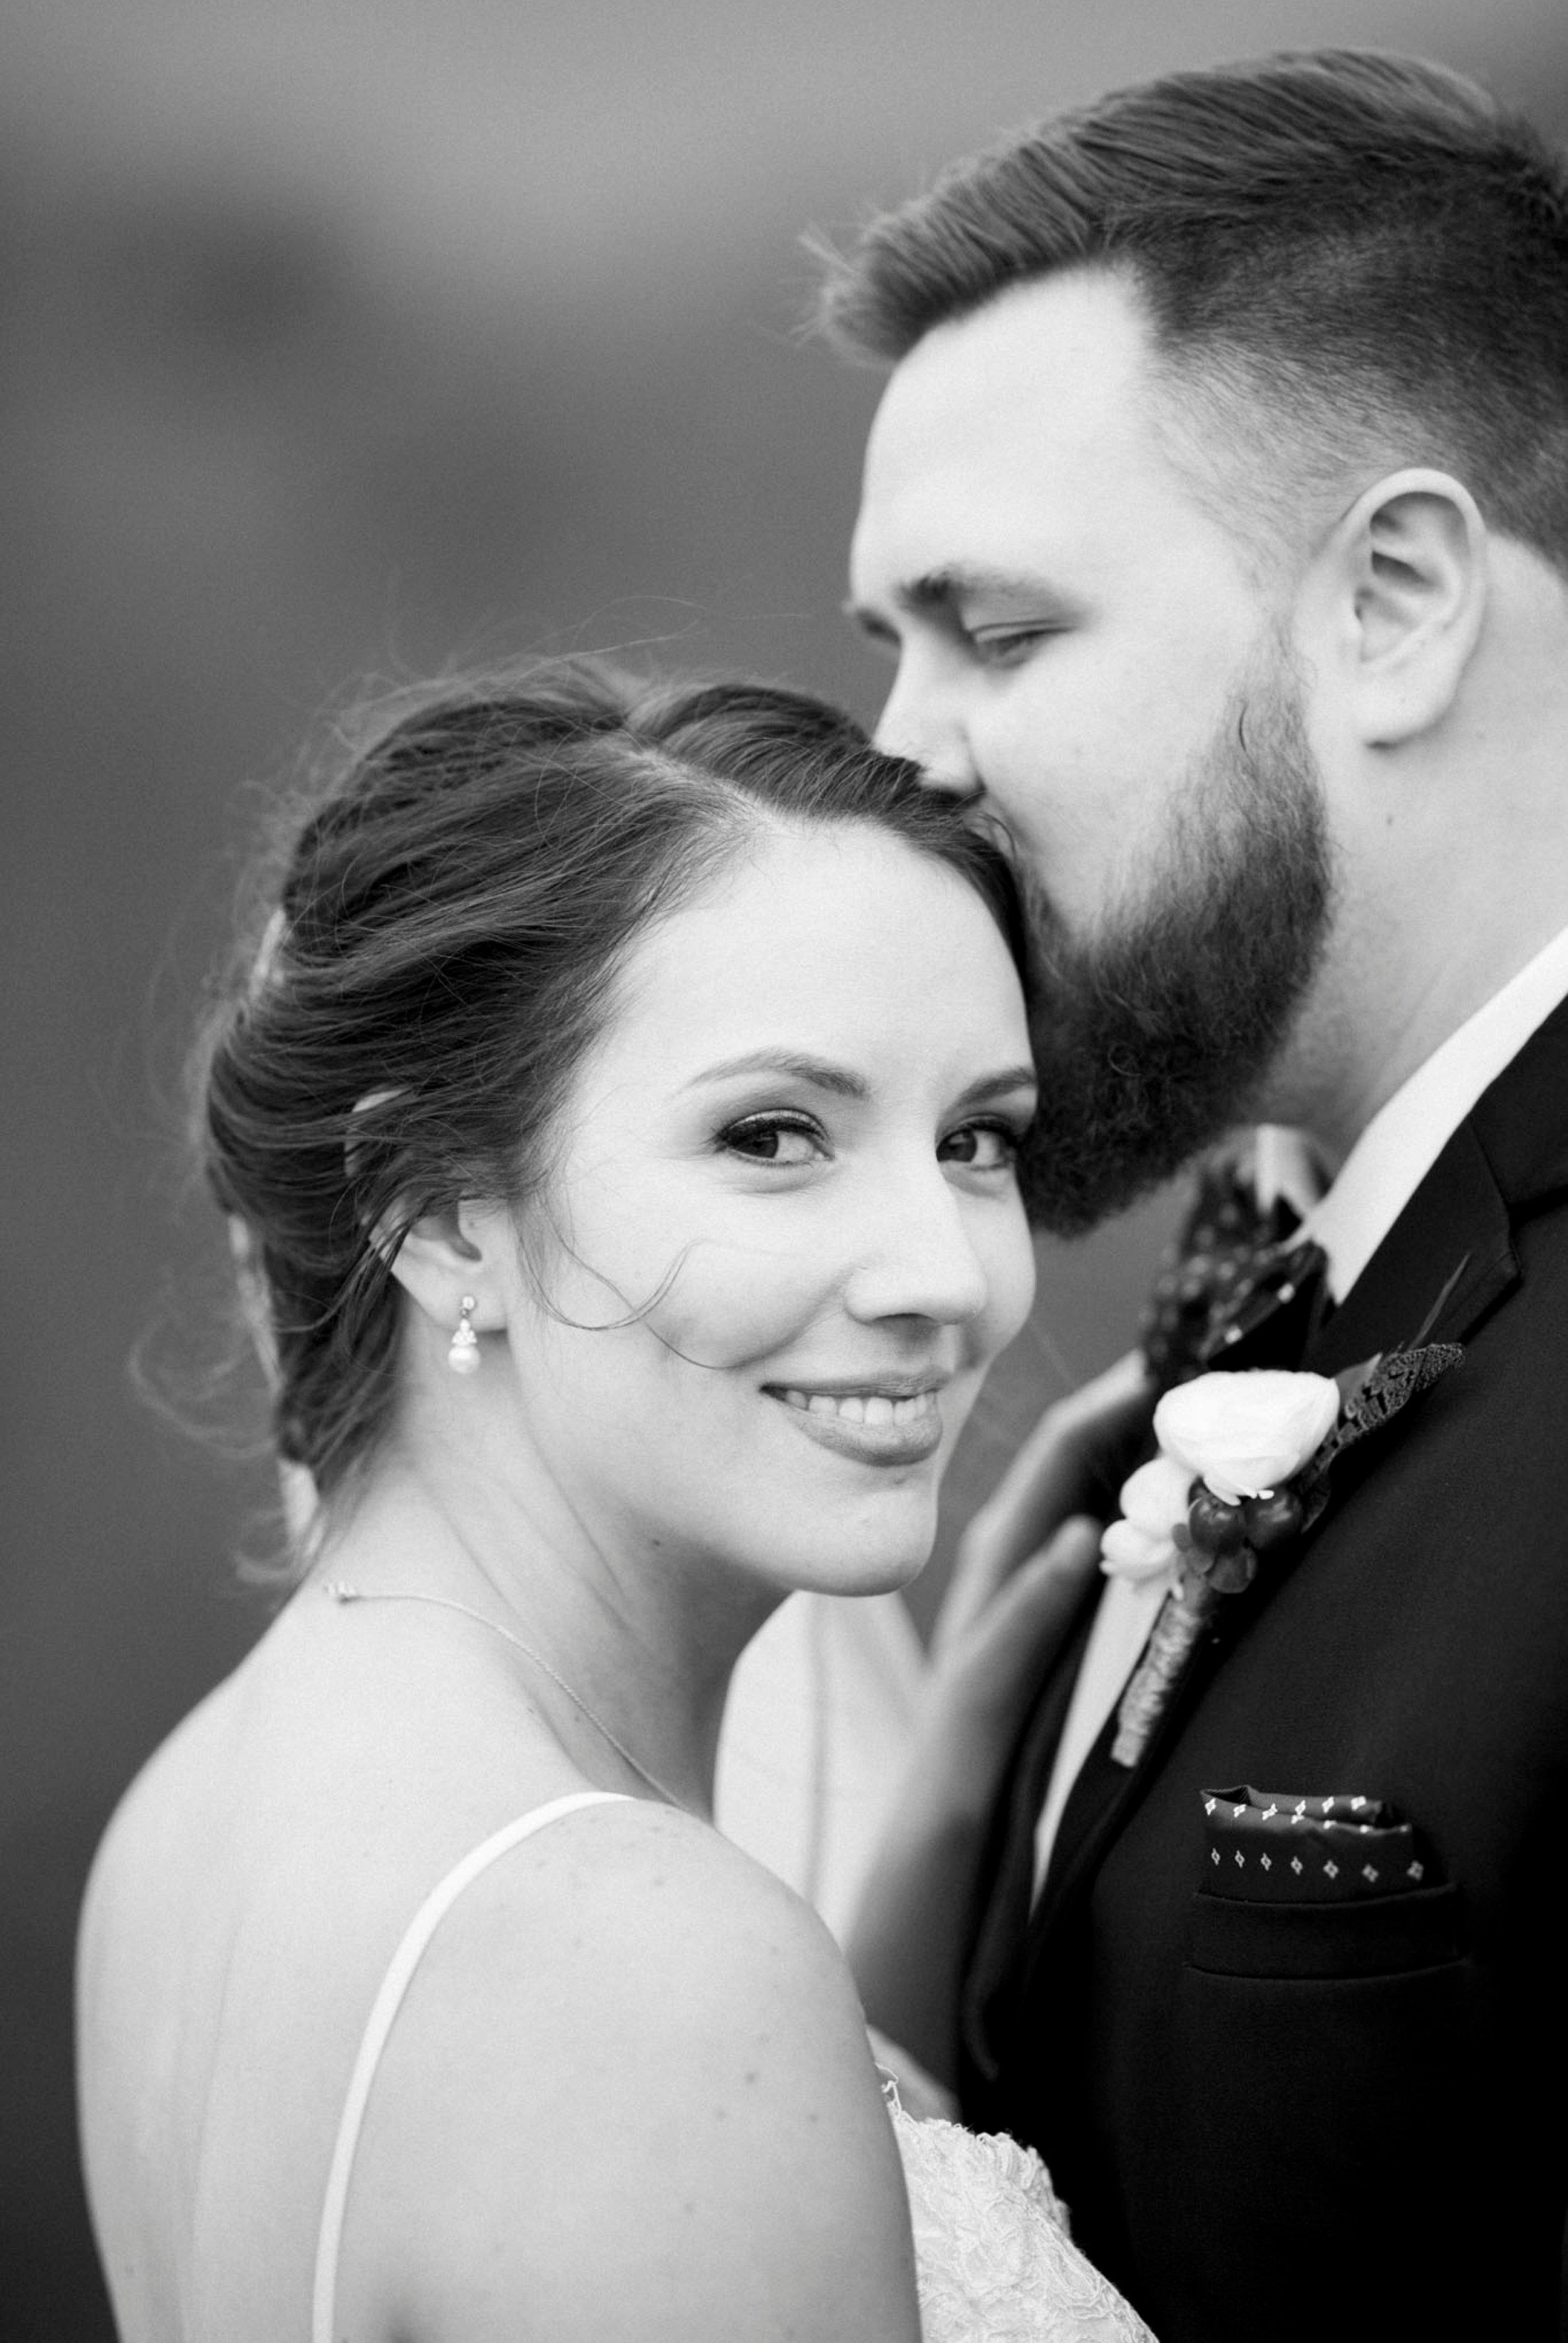 IrvineEstate_LexingtonVA_Wedding_FallWedding_VirginiaWeddingPhotographer 89.jpg